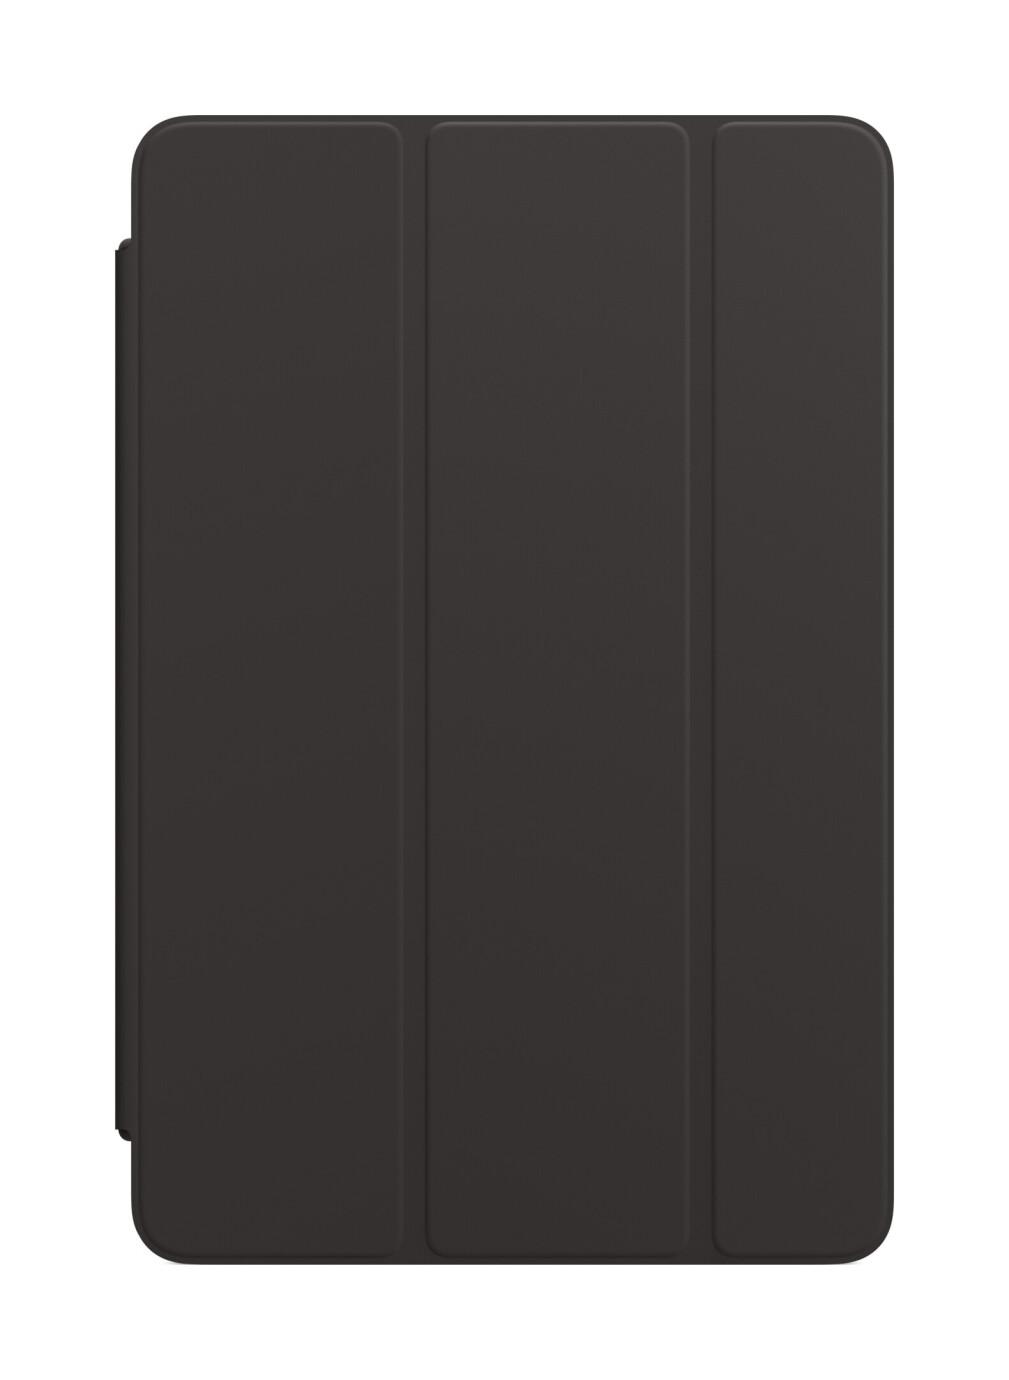 Apple Smart Cover für iPad mini (4+5. Generation) - Schwarz